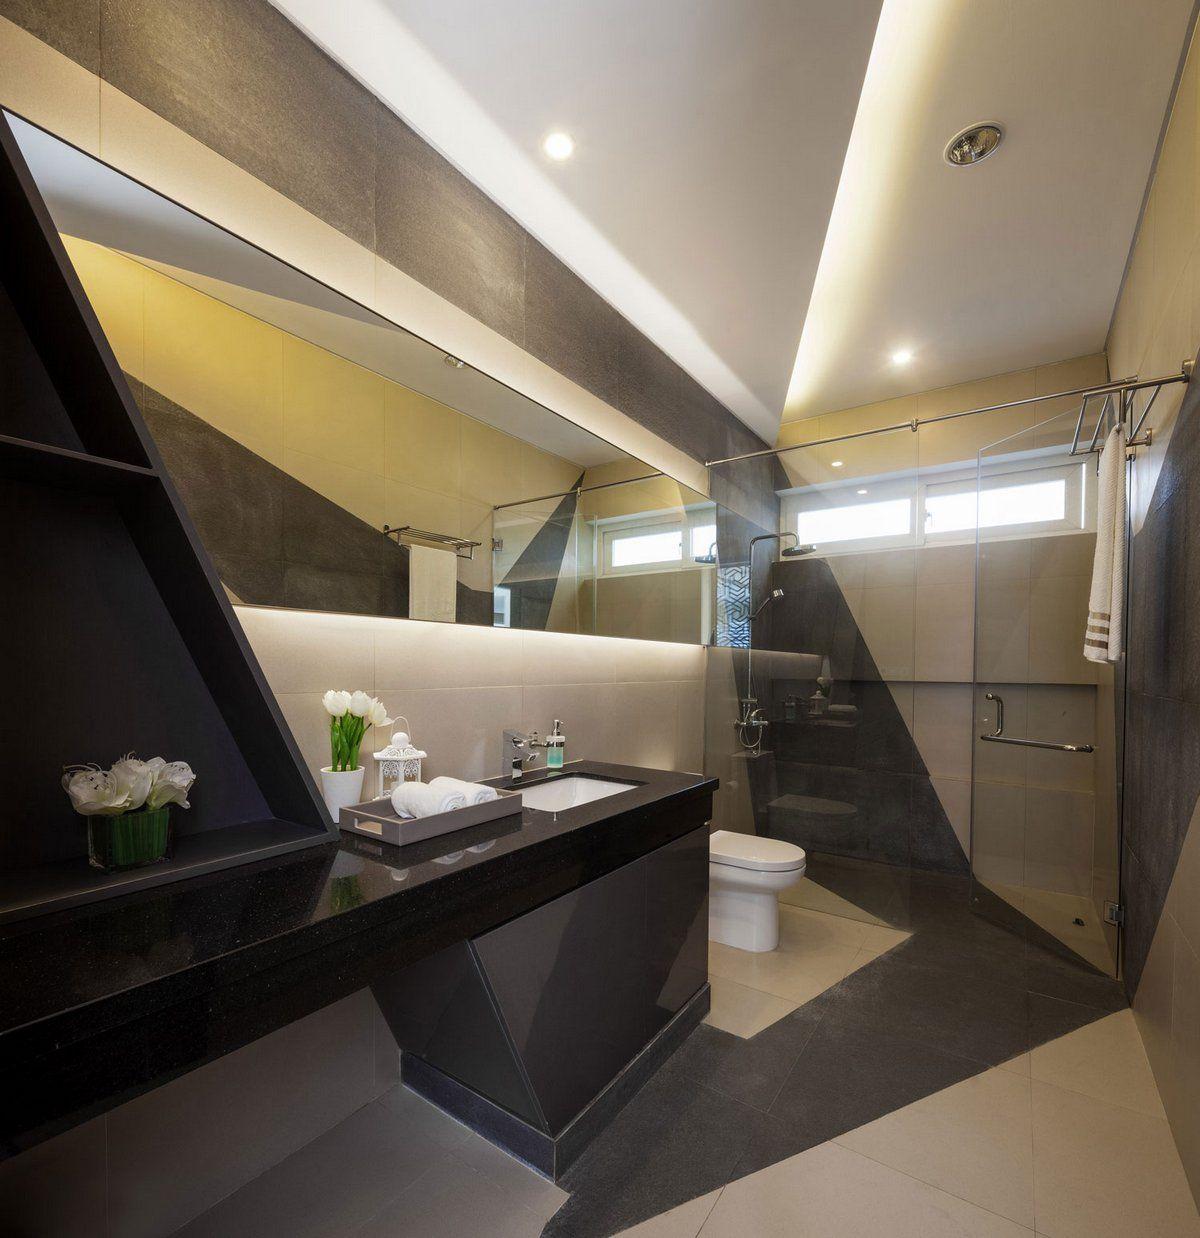 Интерьер жилого дома Галерея 3dddru: Резиденция интроверта в Джакарте